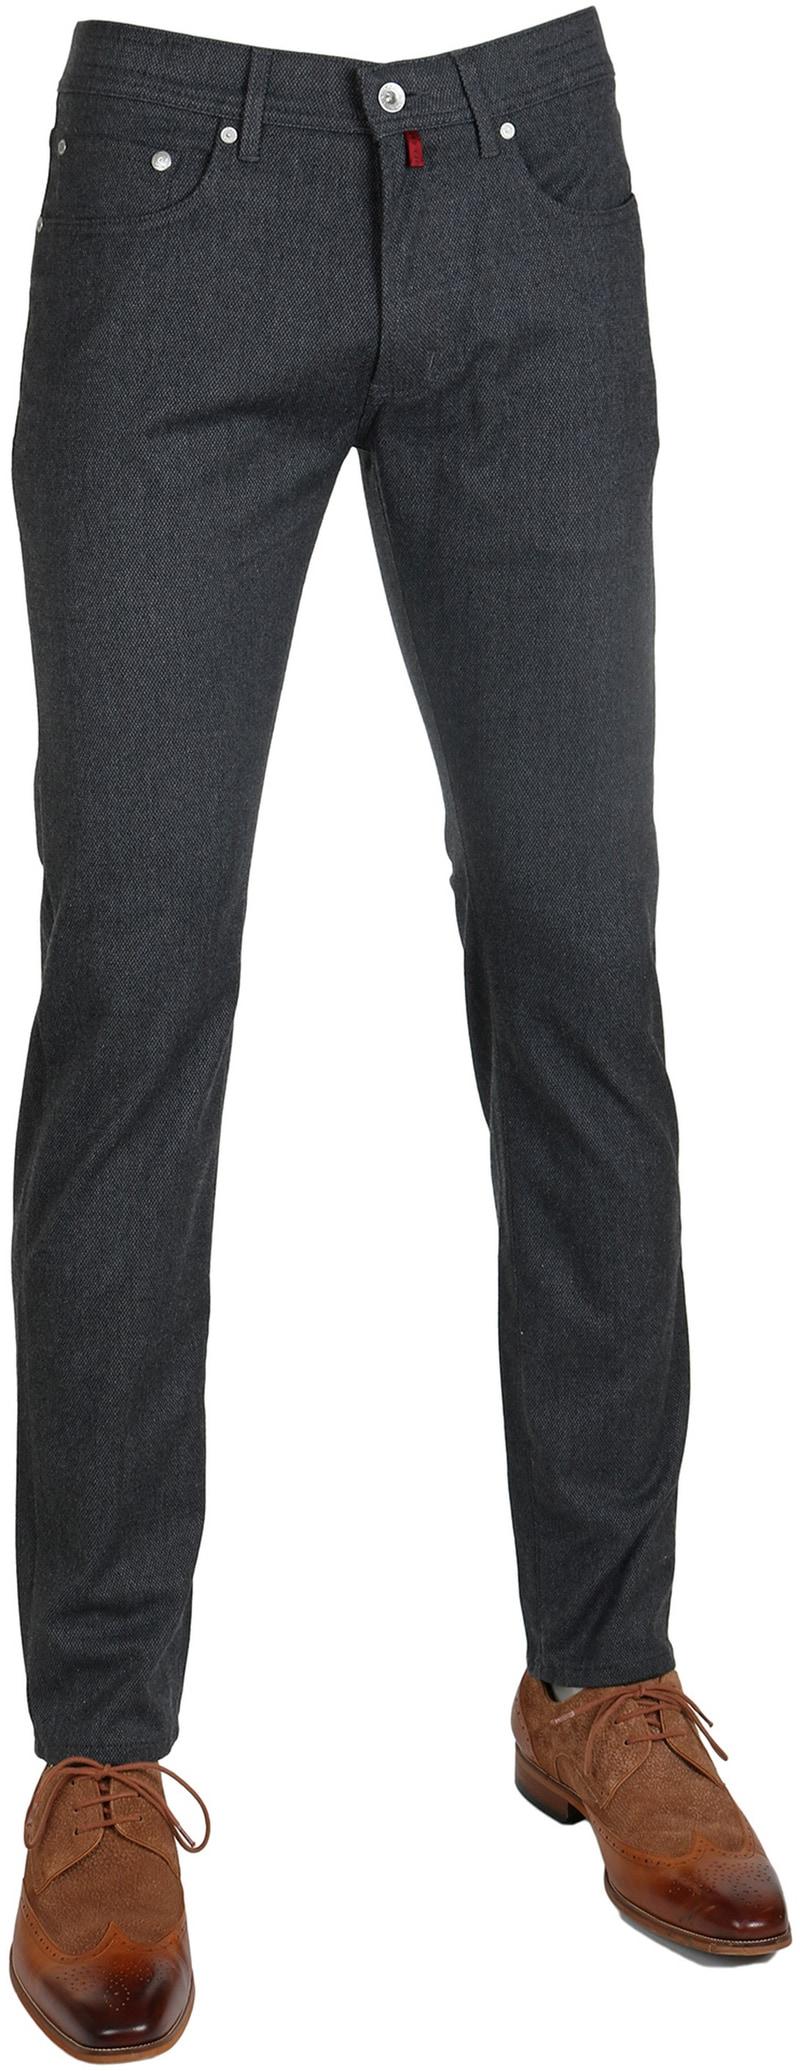 Pierre Cardin Lyon Jeans Antraciet  online bestellen | Suitable